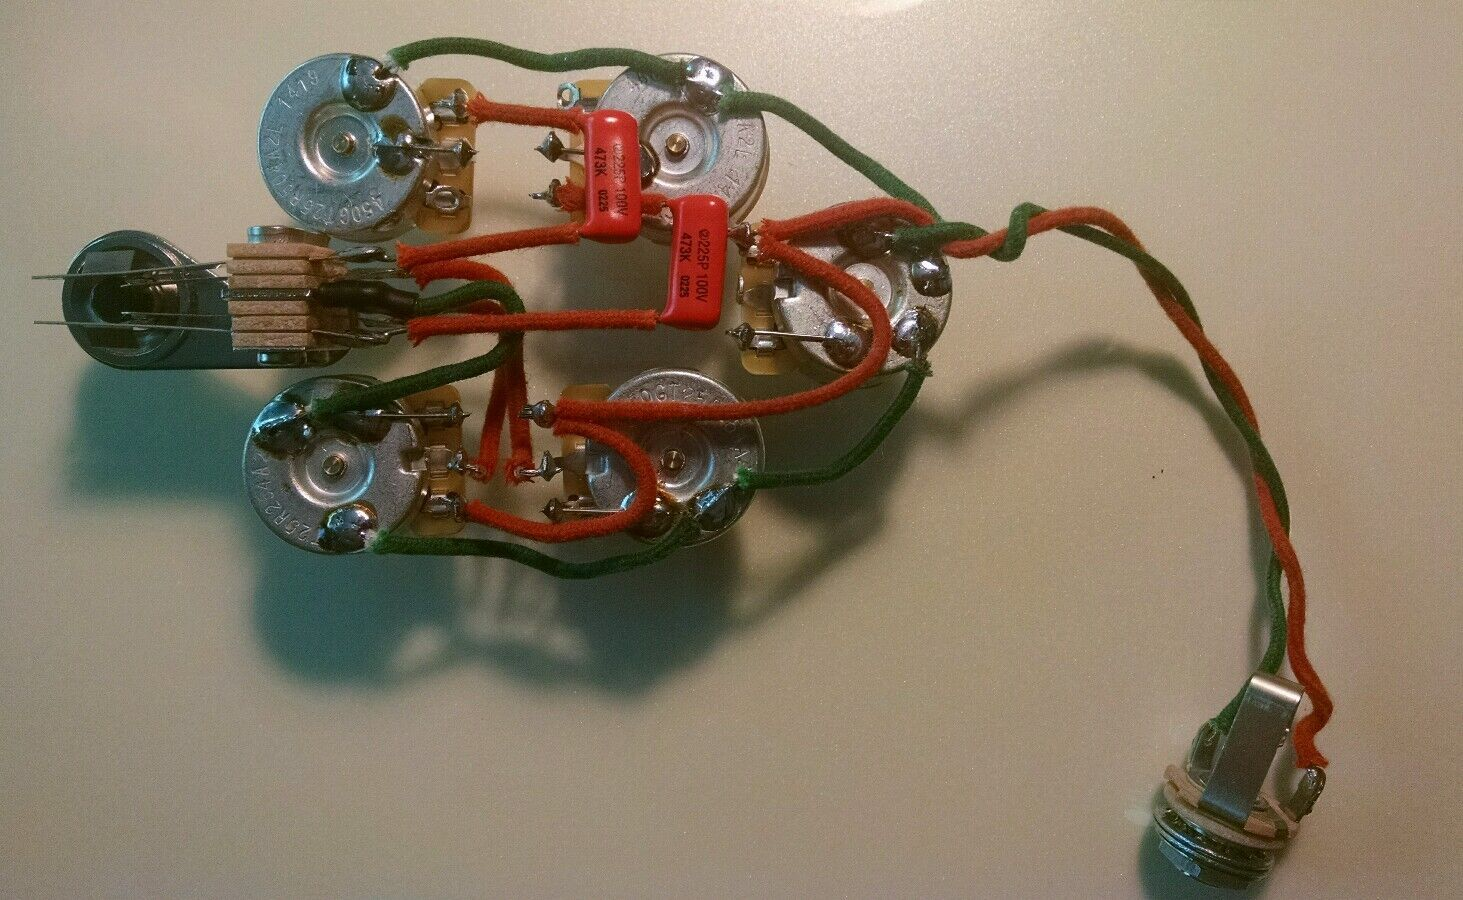 rickenbacker guitar wiring diagrams 2007 ford focus engine diagram 340 370 350sh 3 pickup 5 control